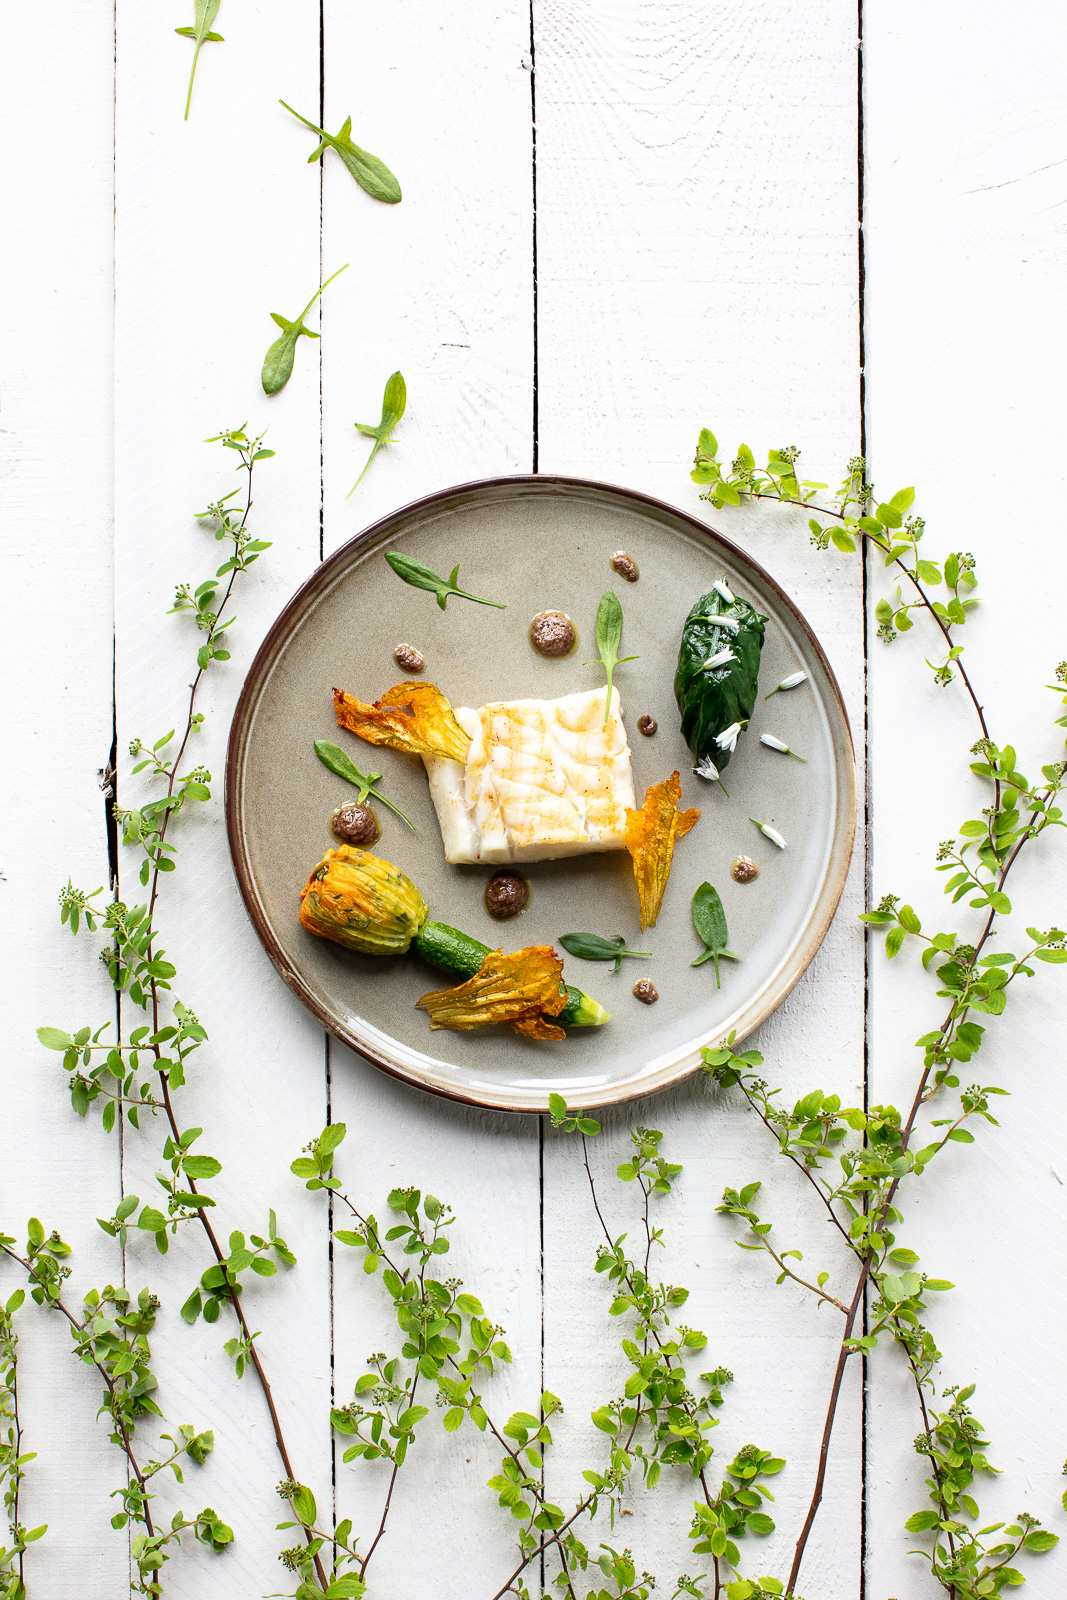 Franck_Hamel_food_photographer_photographeculinaire_valerie_paumelle_agent_st_clair_traiteur (19).jpg